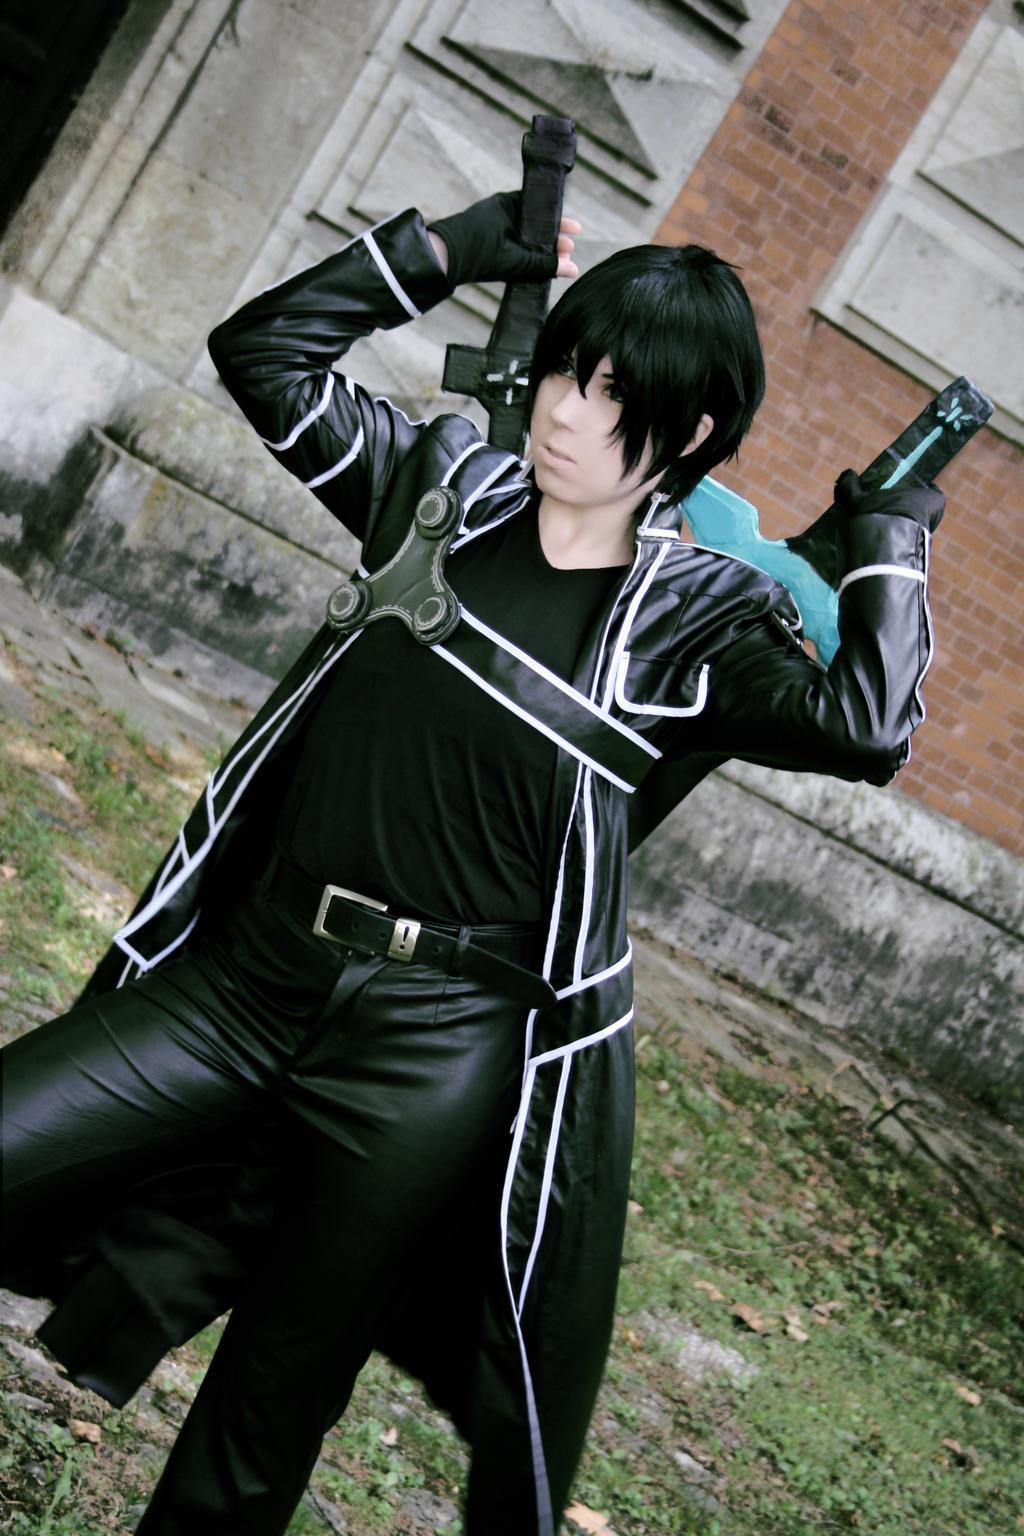 [Cosplay] Sword Art Online Kirito by K-I-M-I on DeviantArt